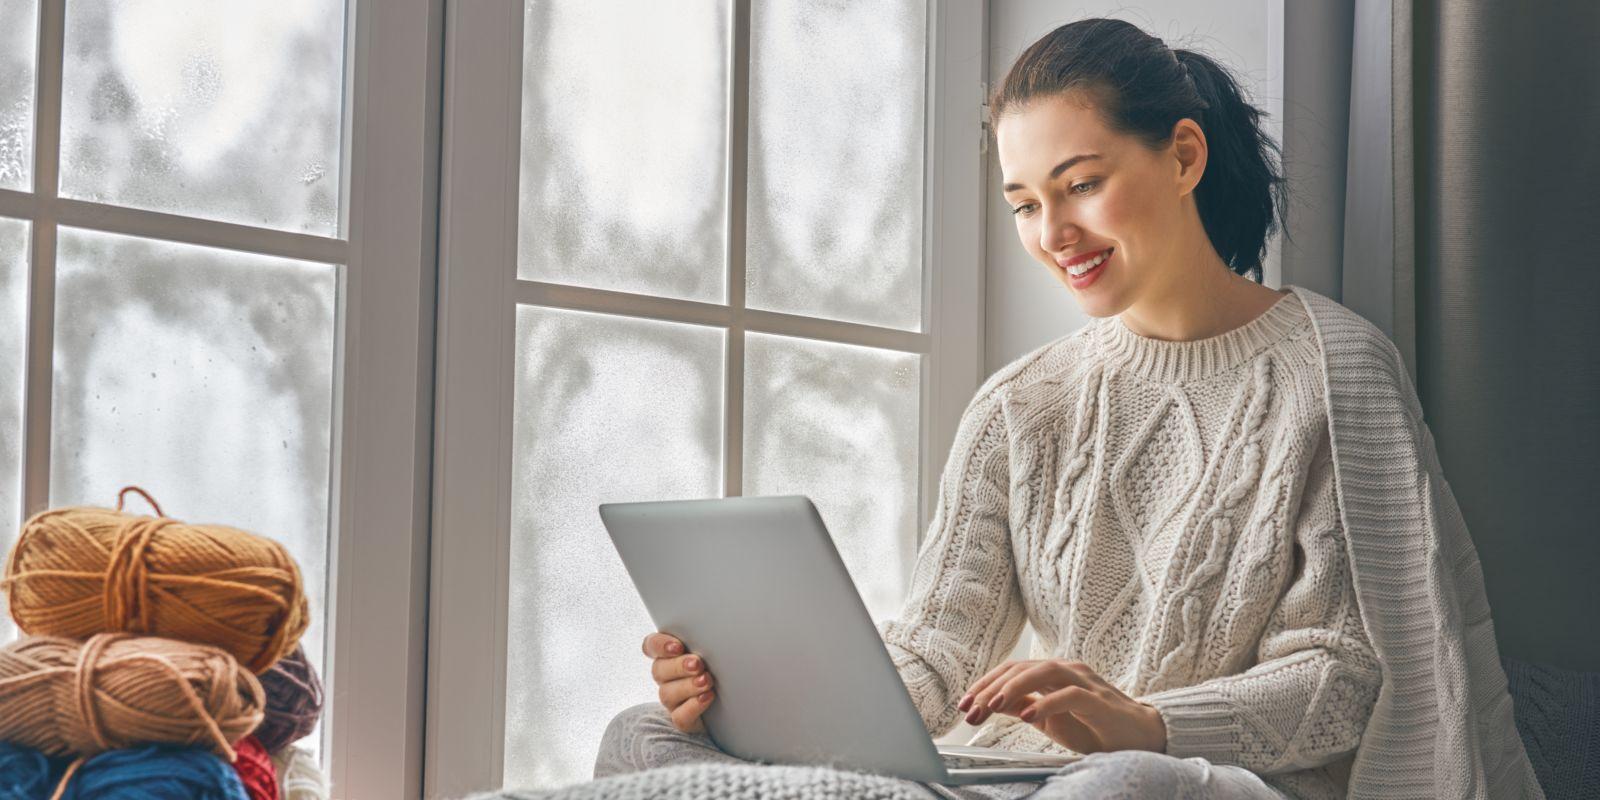 woman sitting near windows using laptop